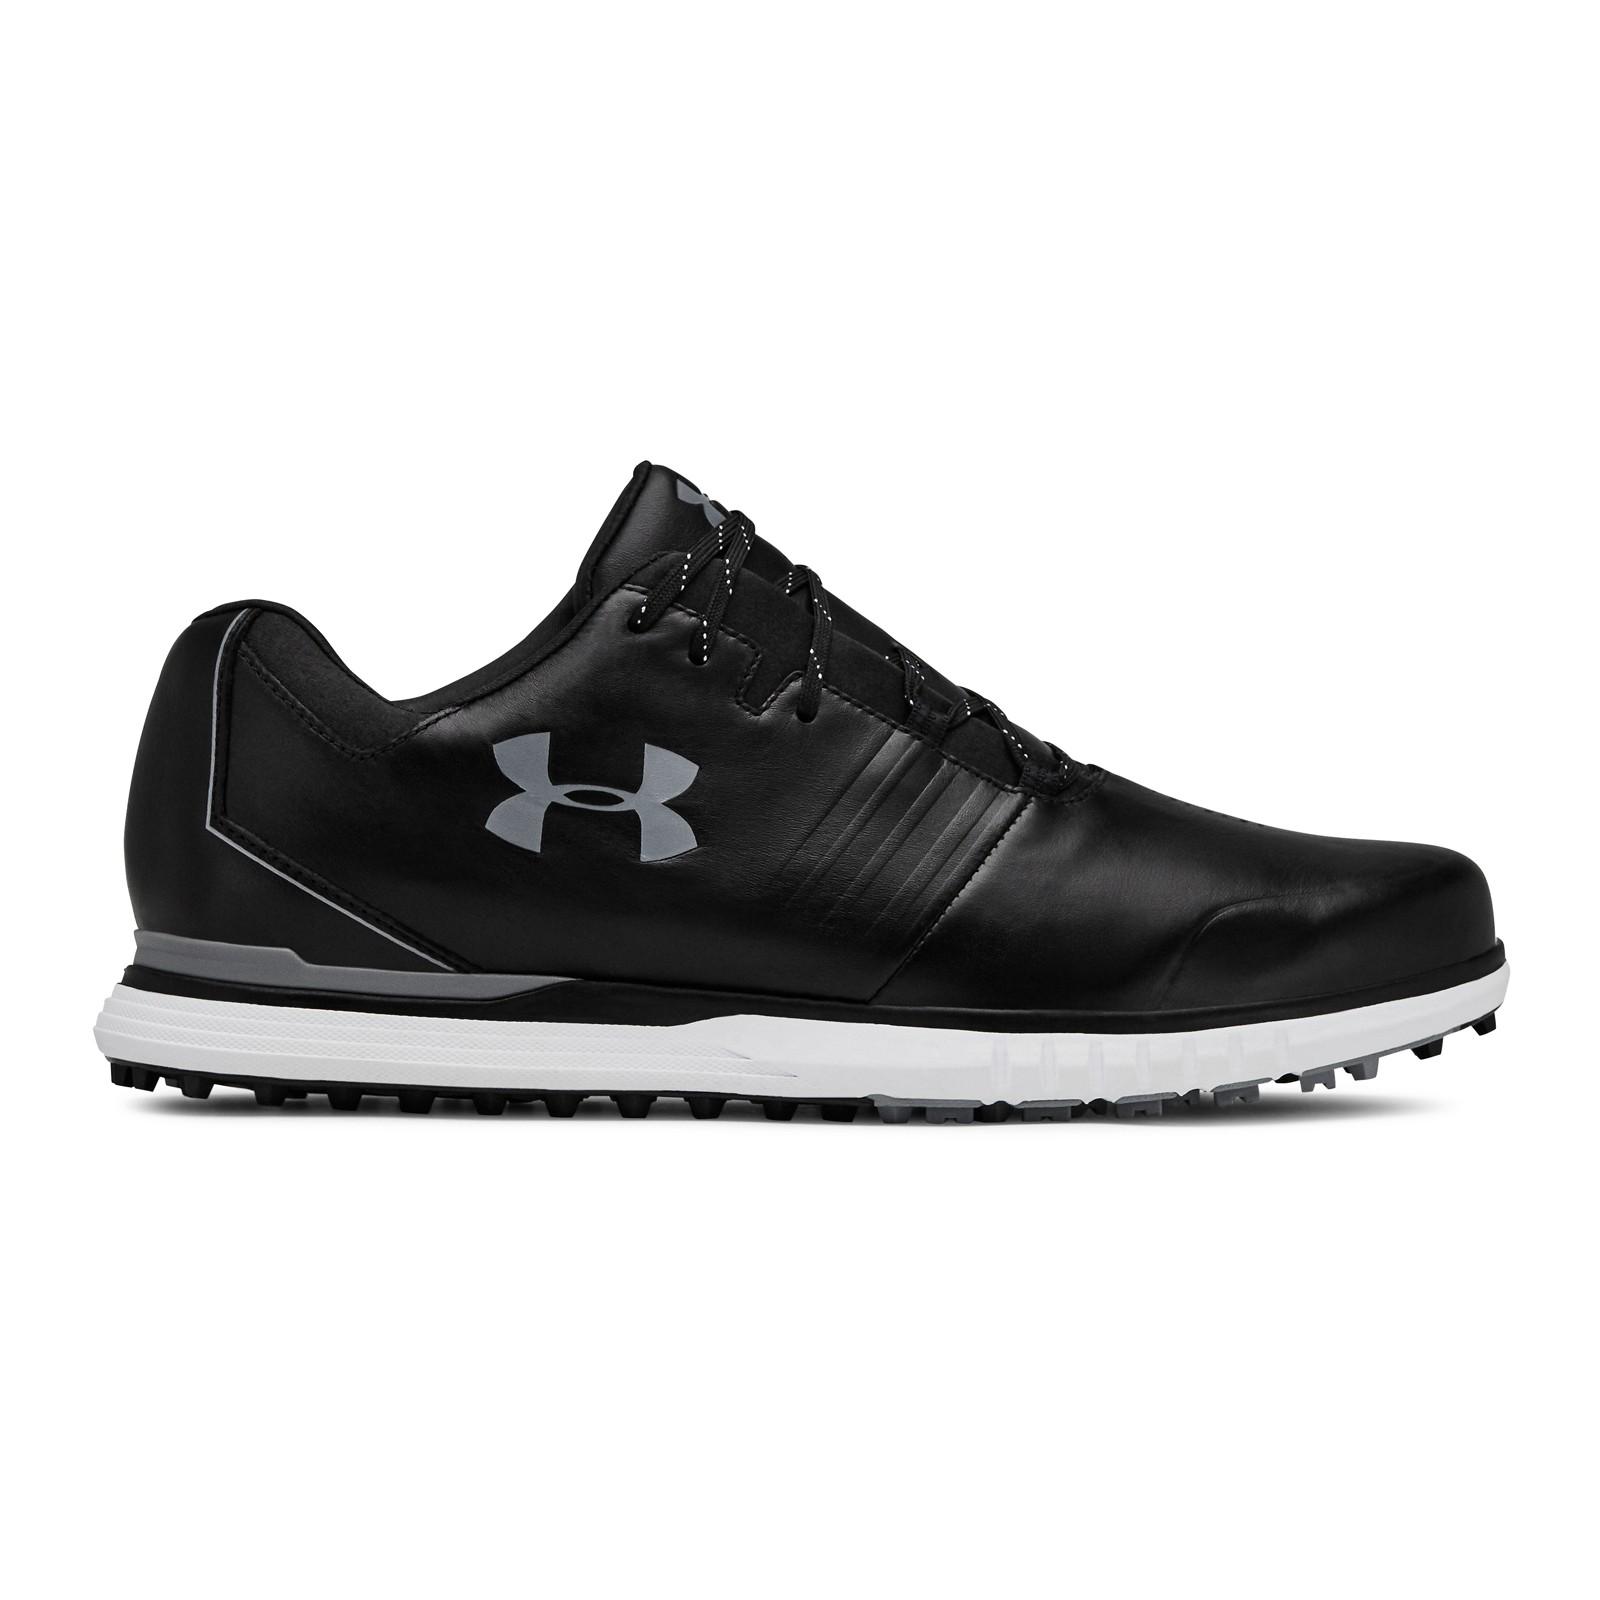 Under Armour Showdown Spikeless Golf Shoes